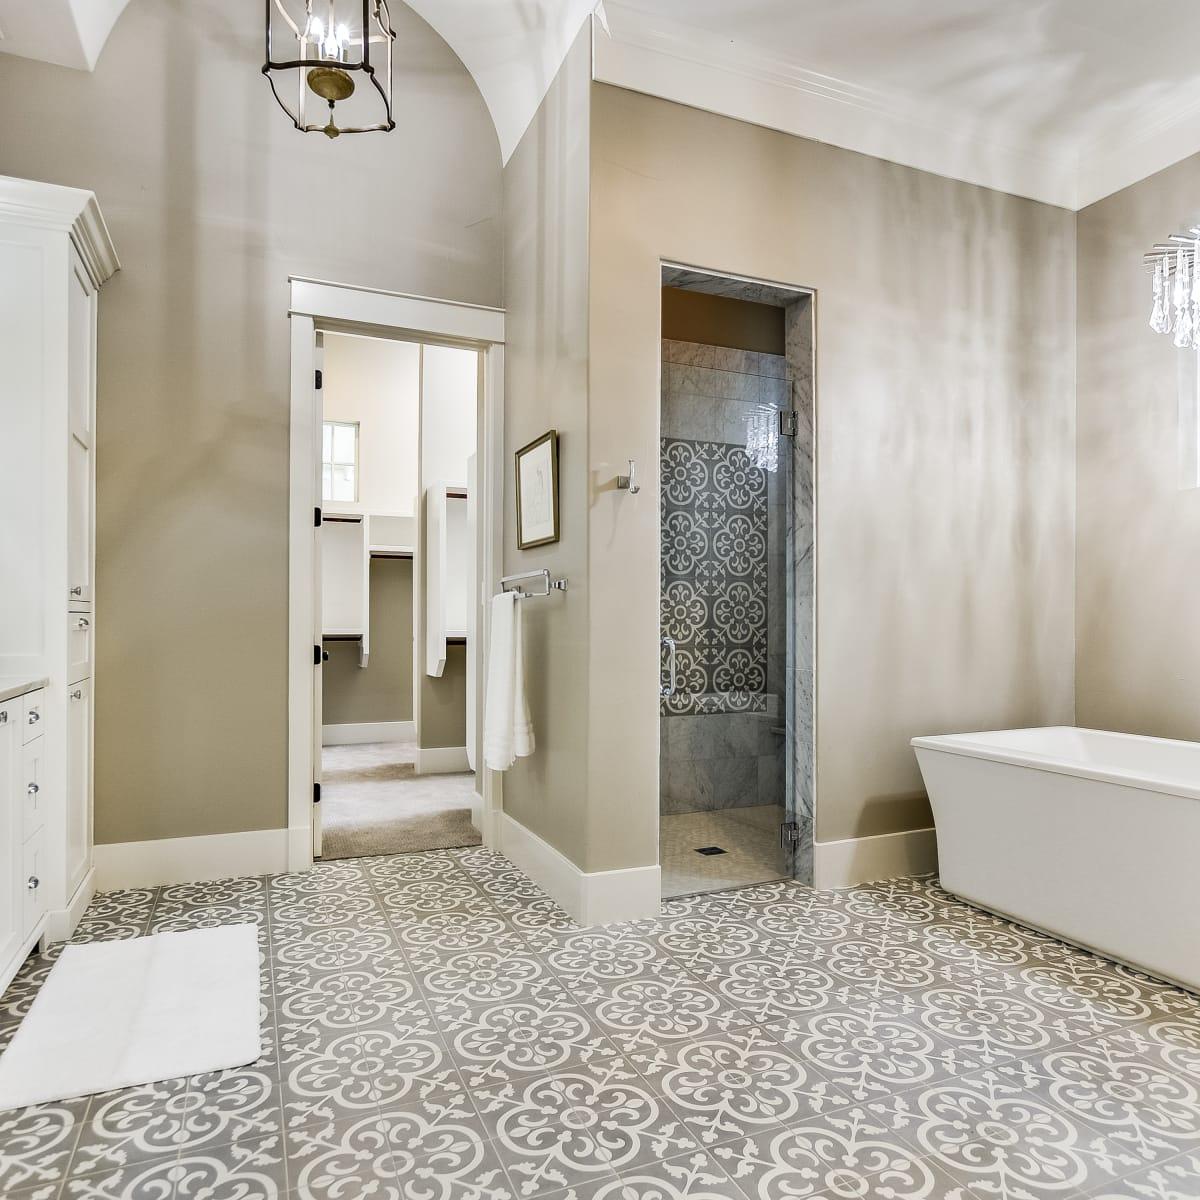 1016 Garraty, San Antonio, house, for sale bathroom